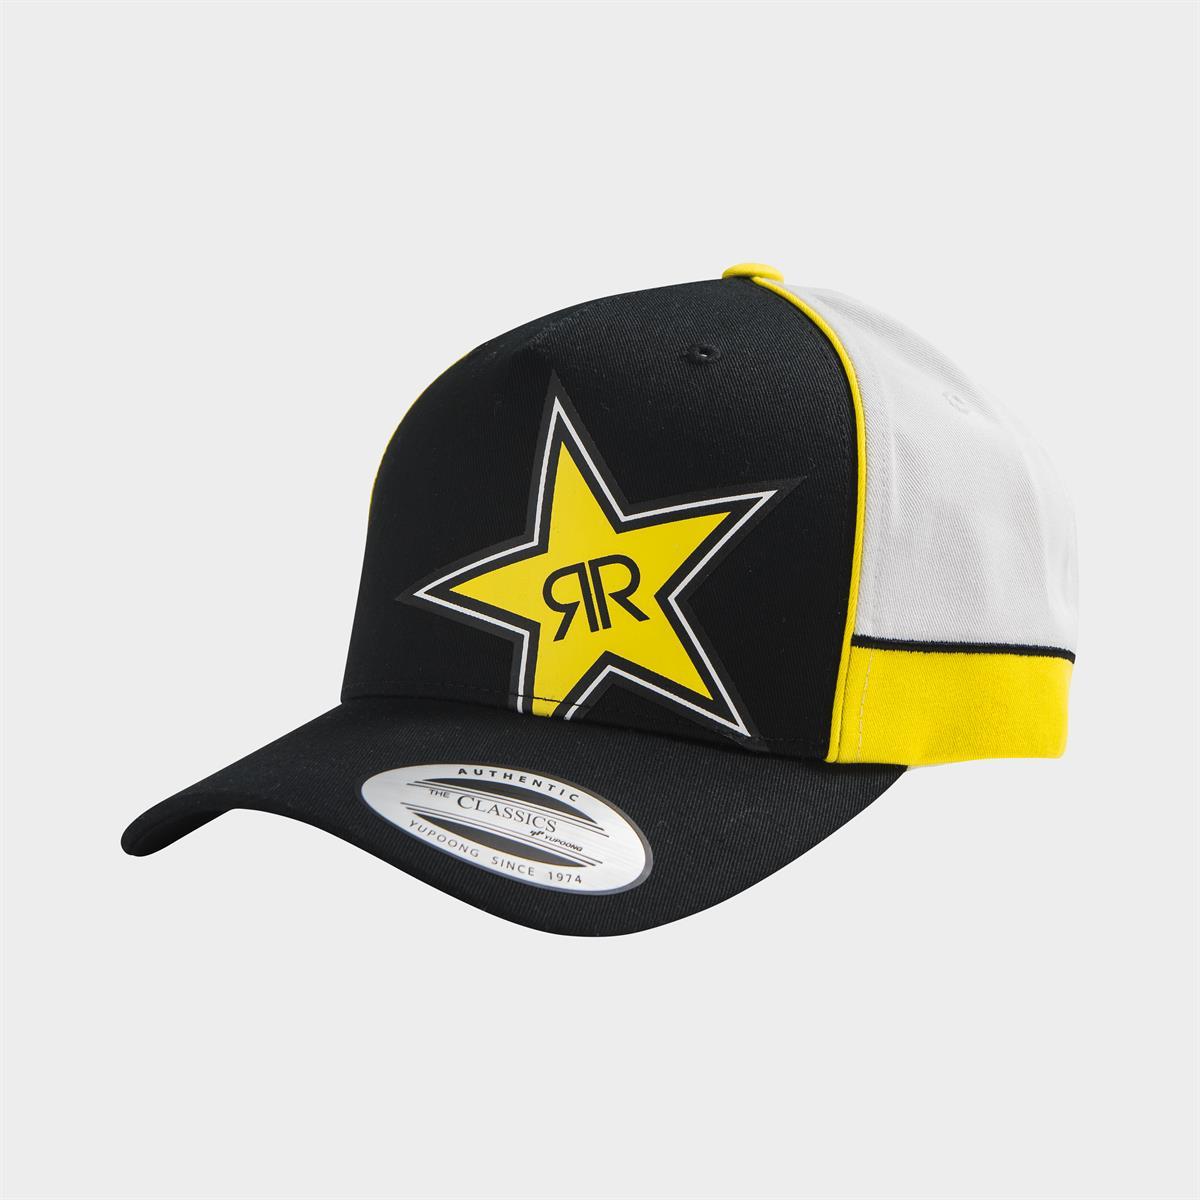 Rockstar Energy Husqvarna Factory Racing Replica Collection Team Cap